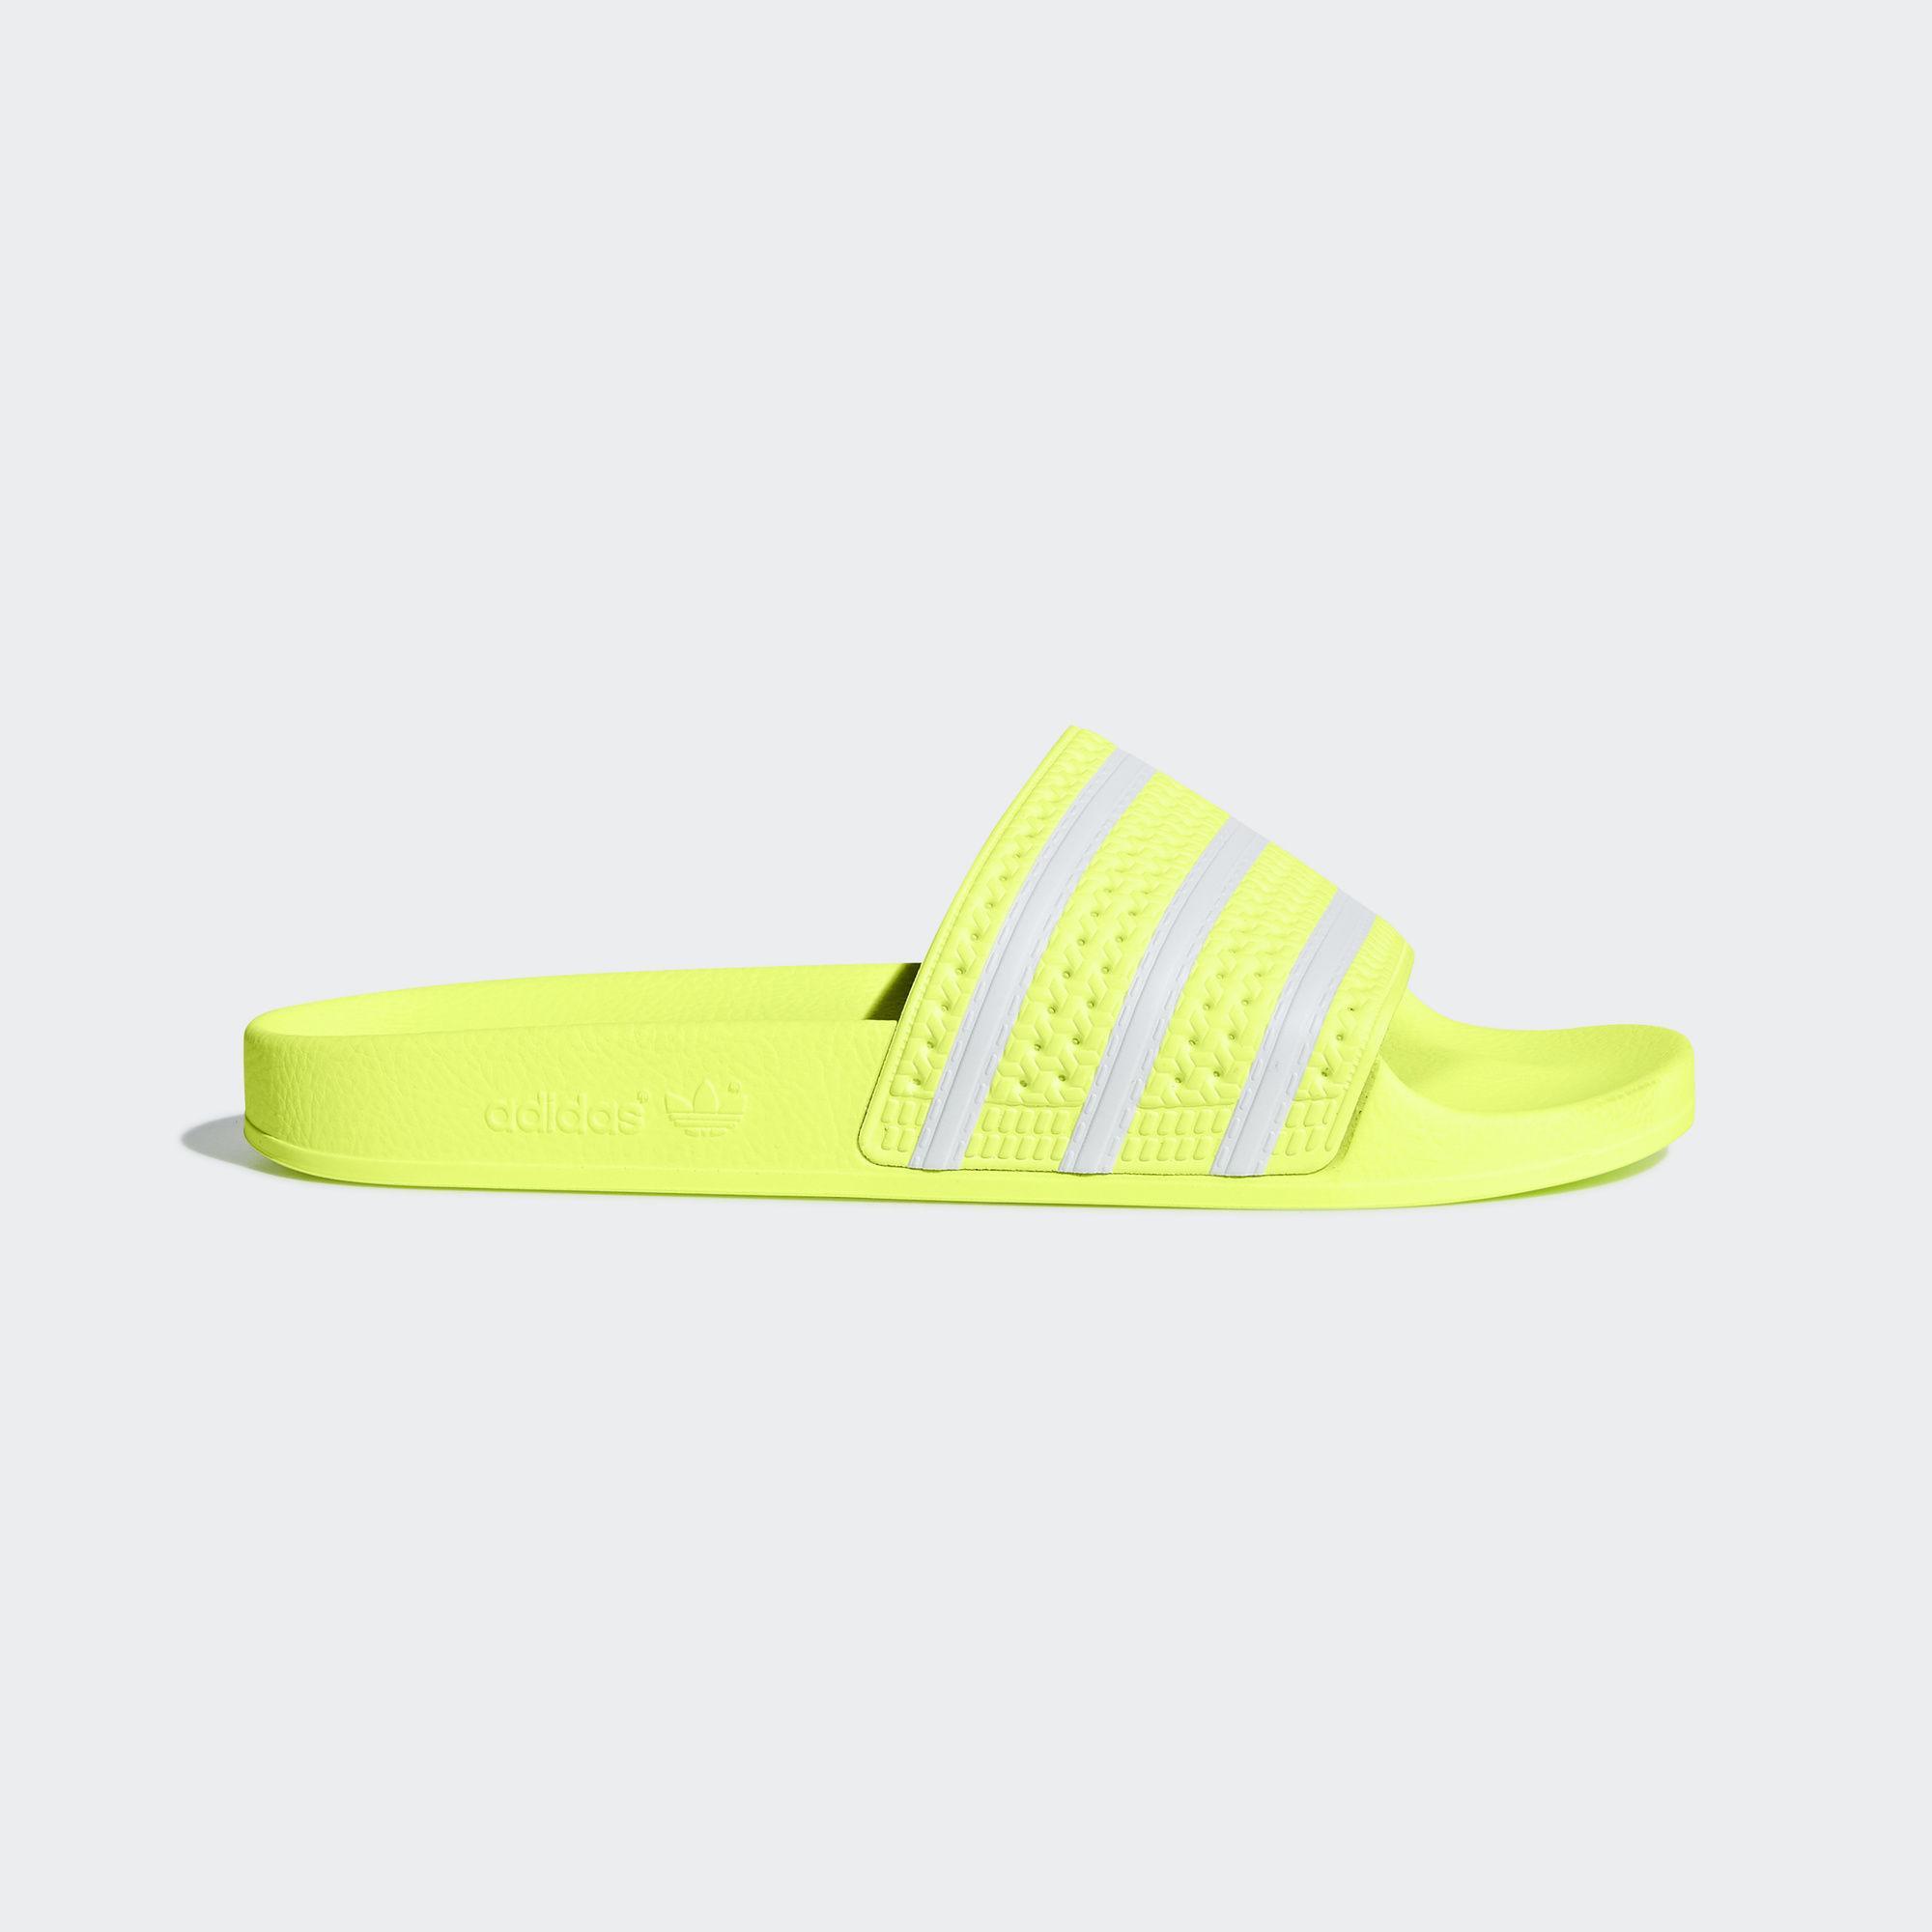 05aab928c adidas Adilette Slides in Yellow - Lyst